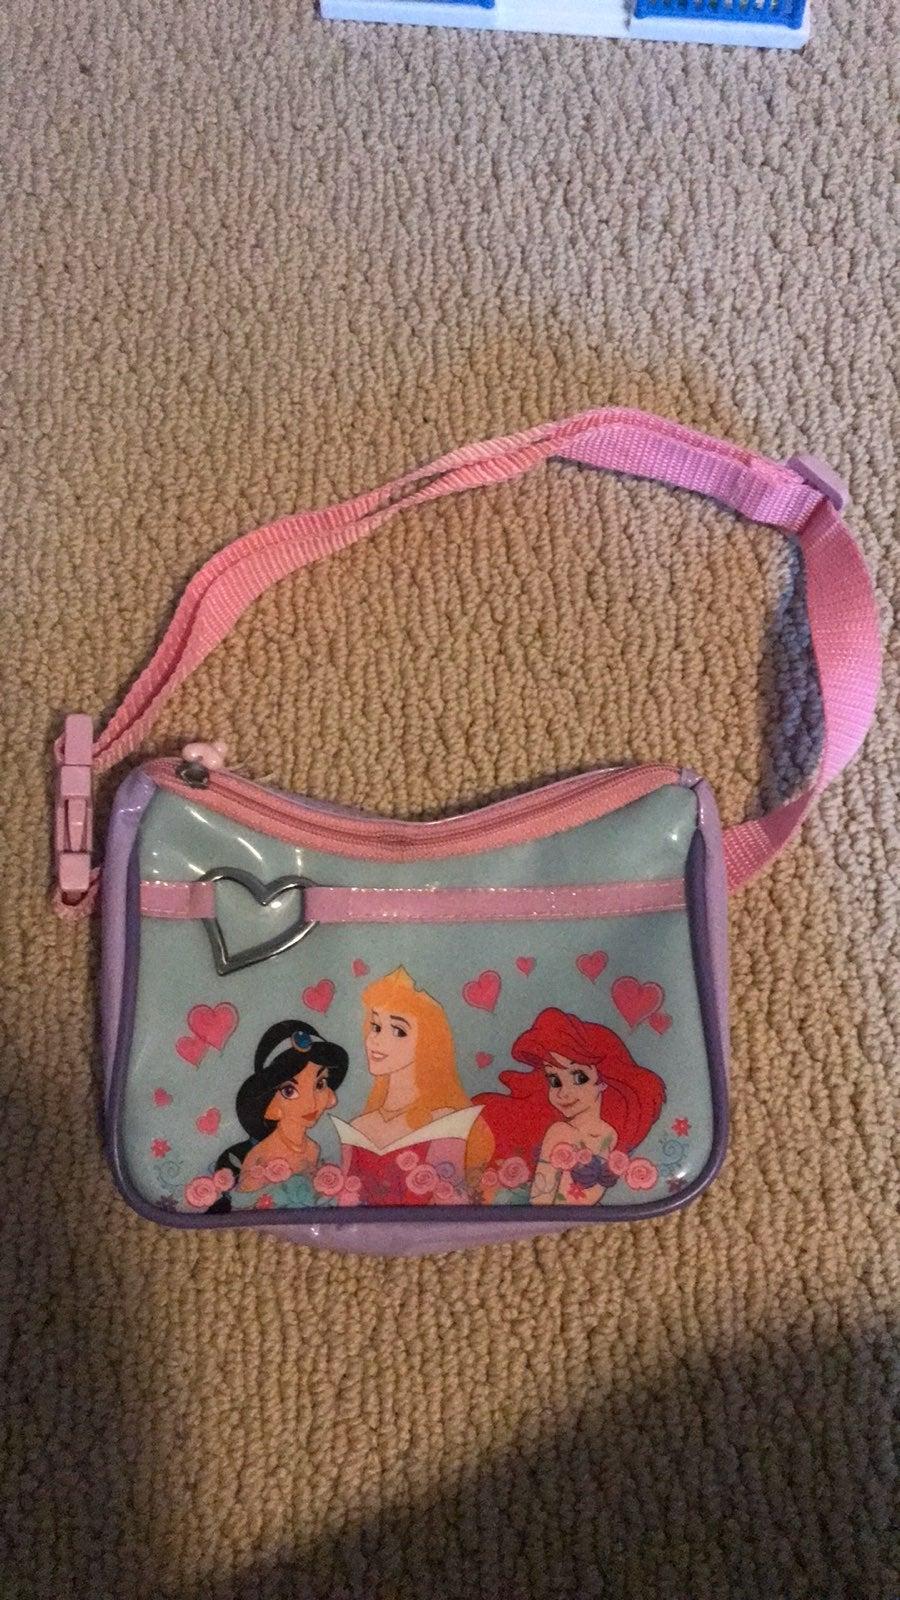 Disney travel pouch